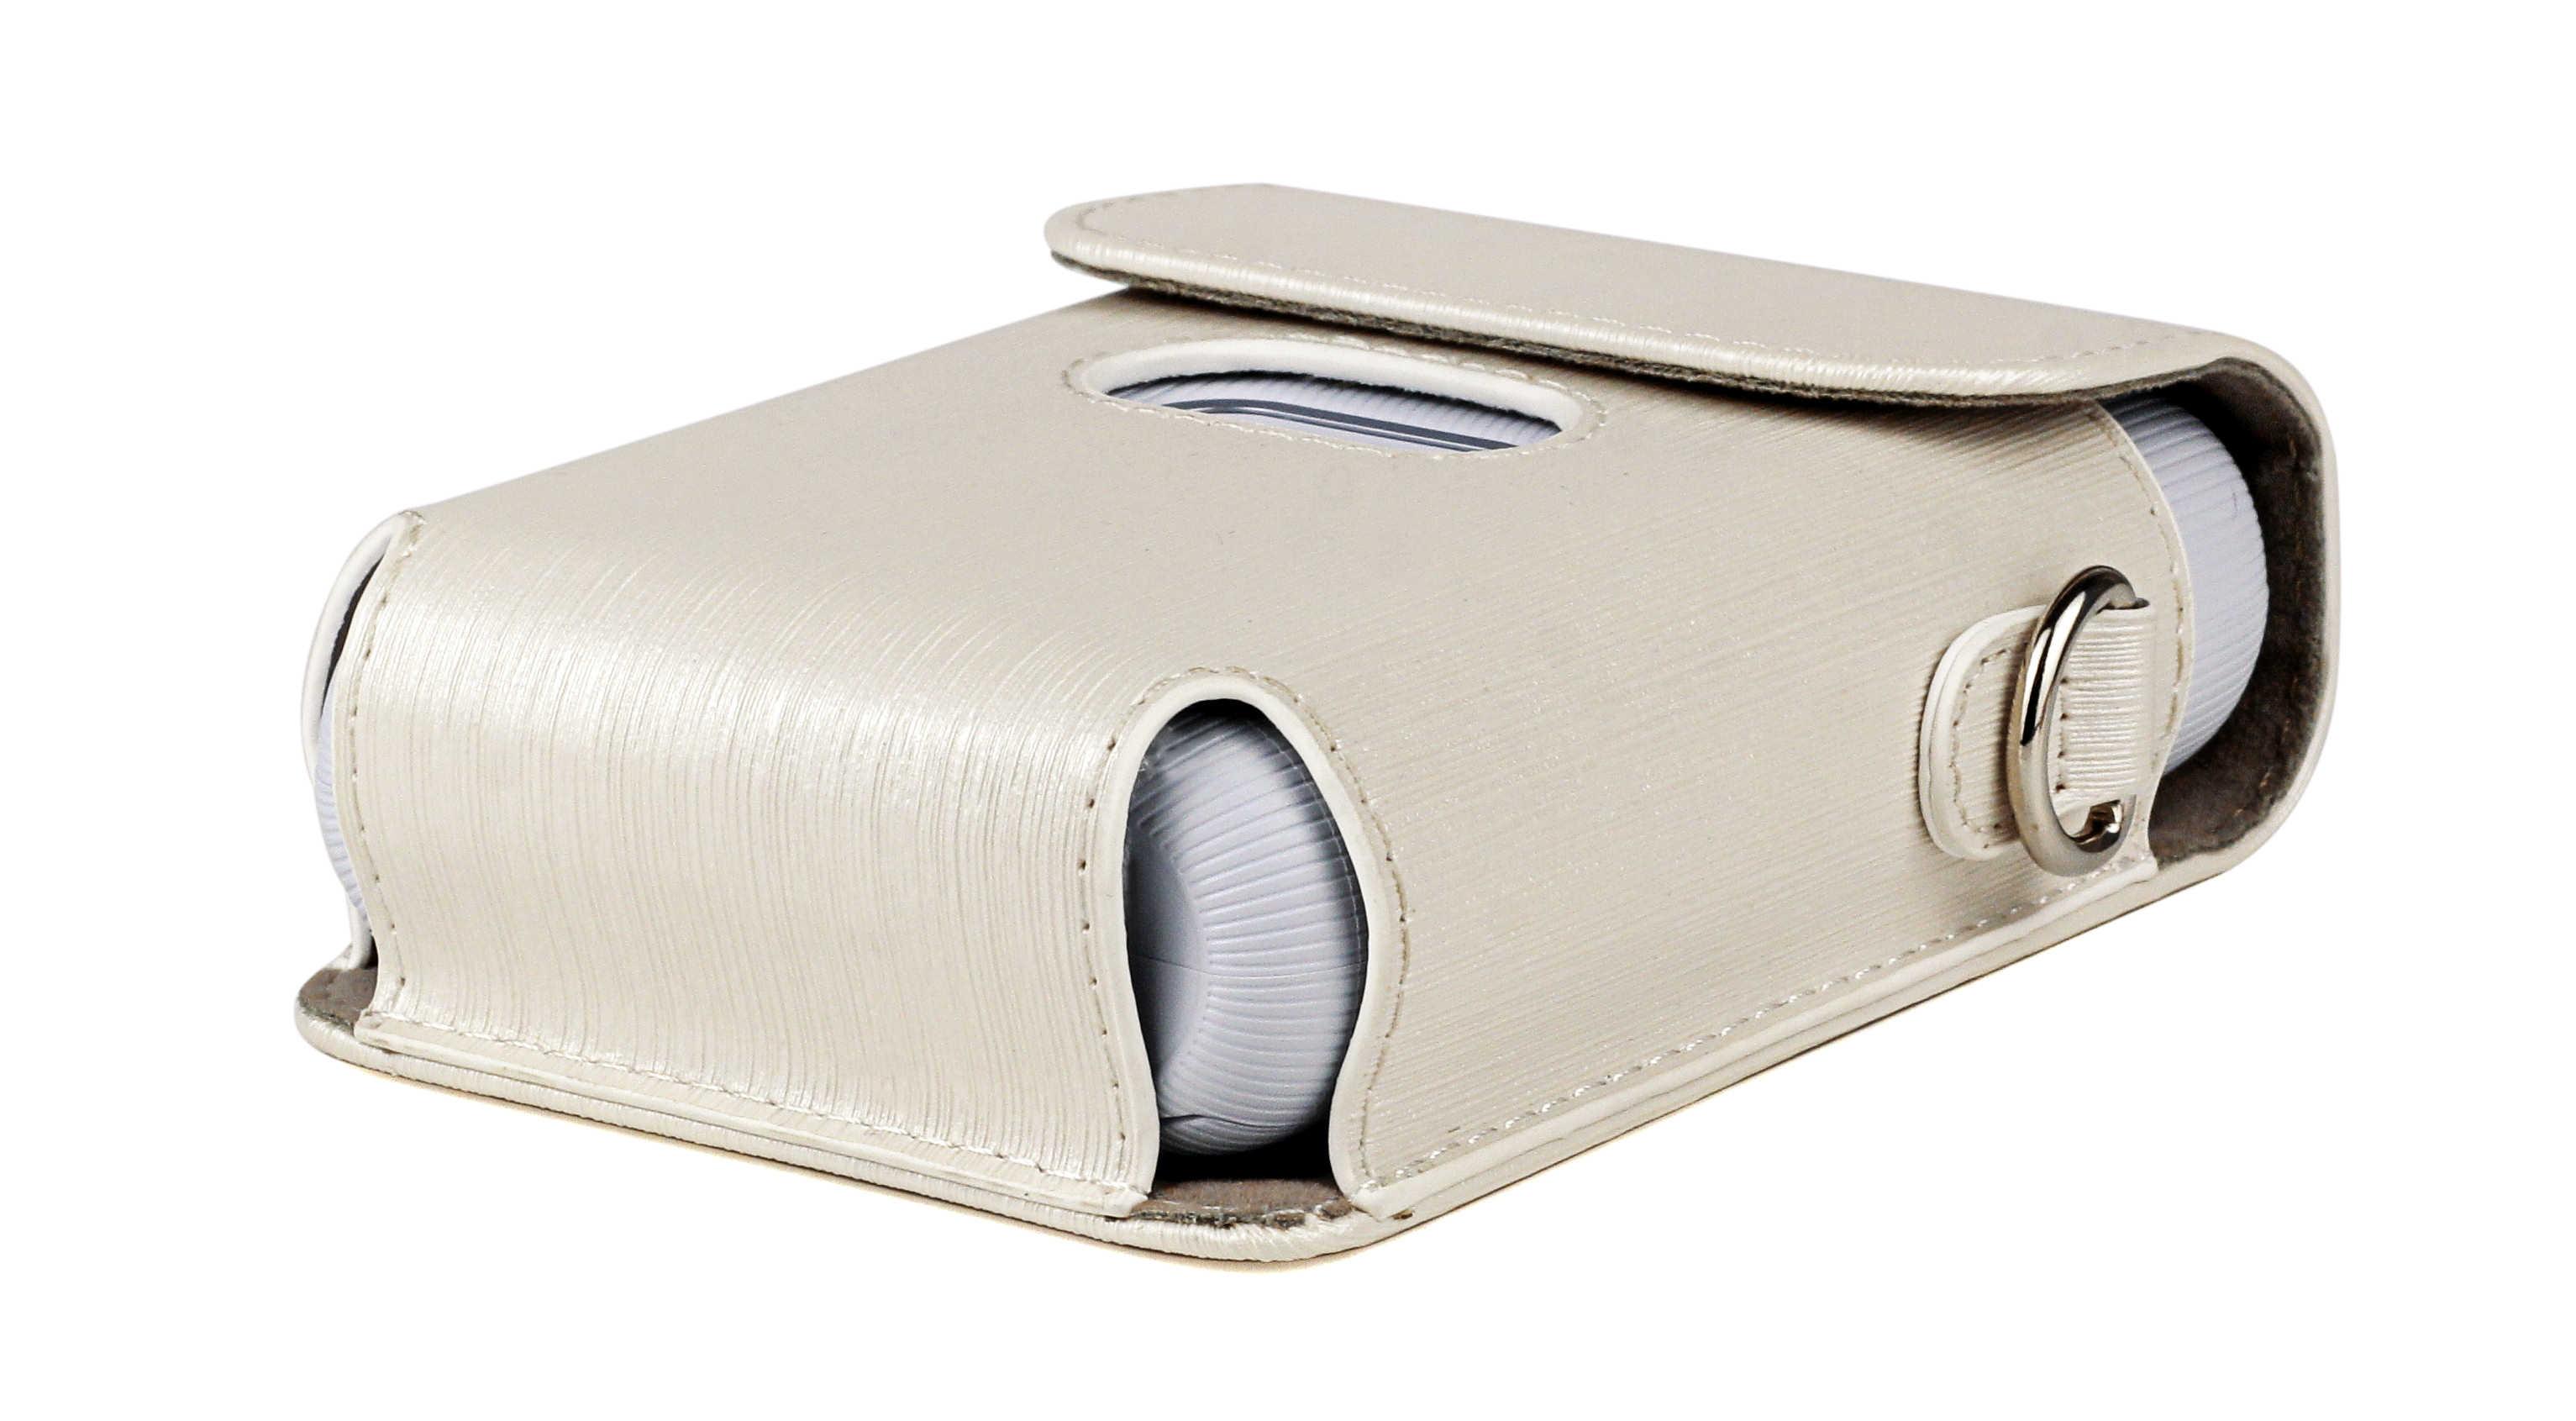 Estuche r/ígido para la Impresora Fujifilm Instax Mini Link Smartphone Forro Negro Negro Bolsa de Almacenamiento de Viaje